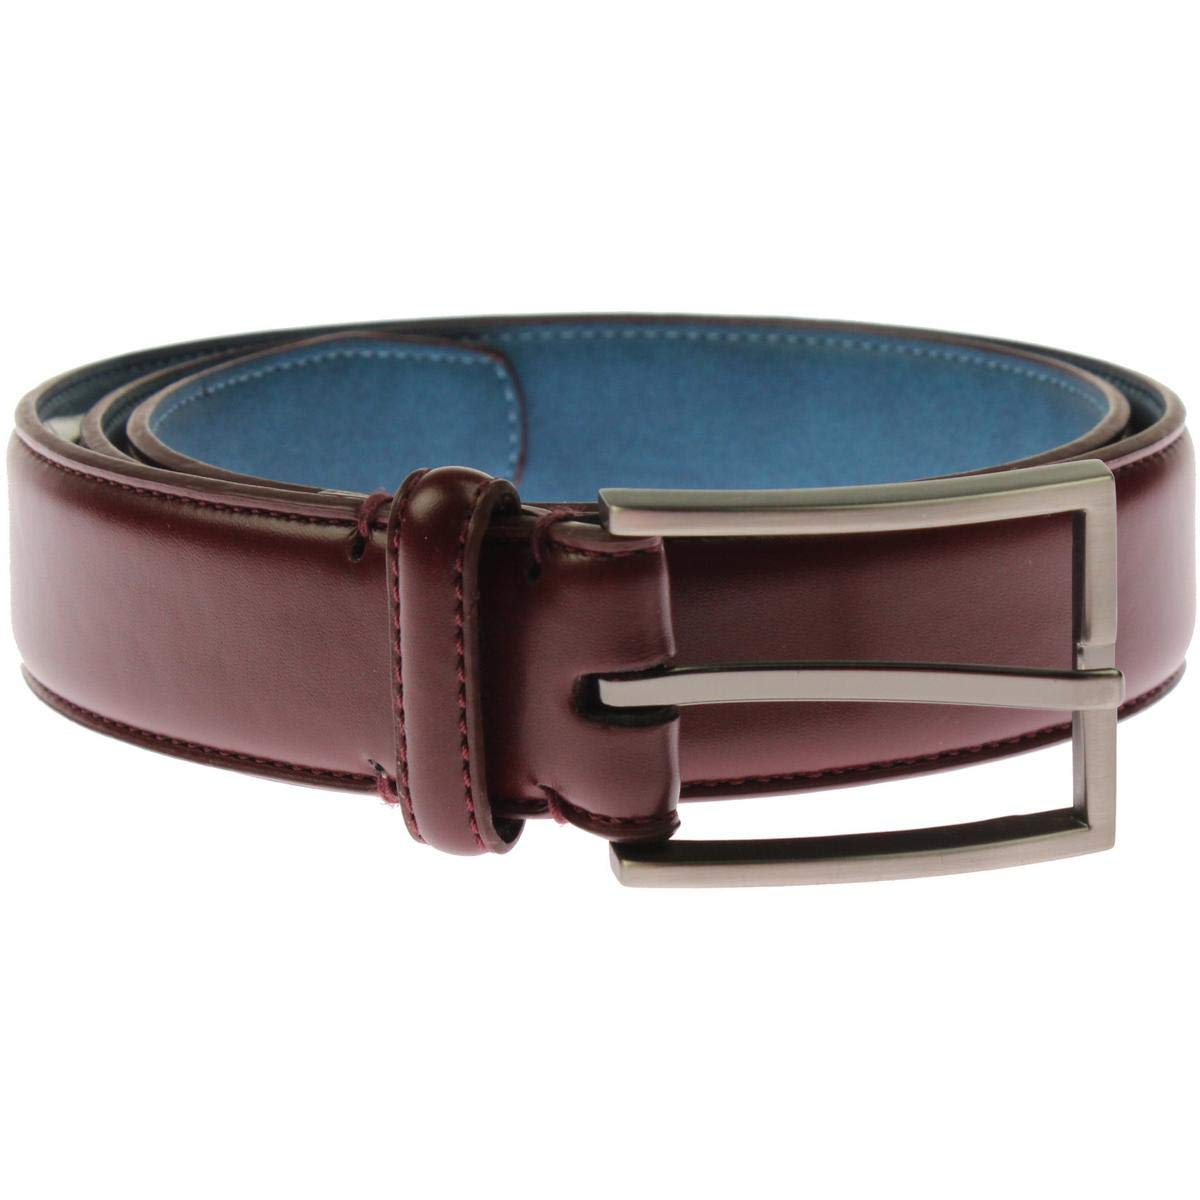 Ryan Seacrest Mens Coated Leather Dress Belt Red 34